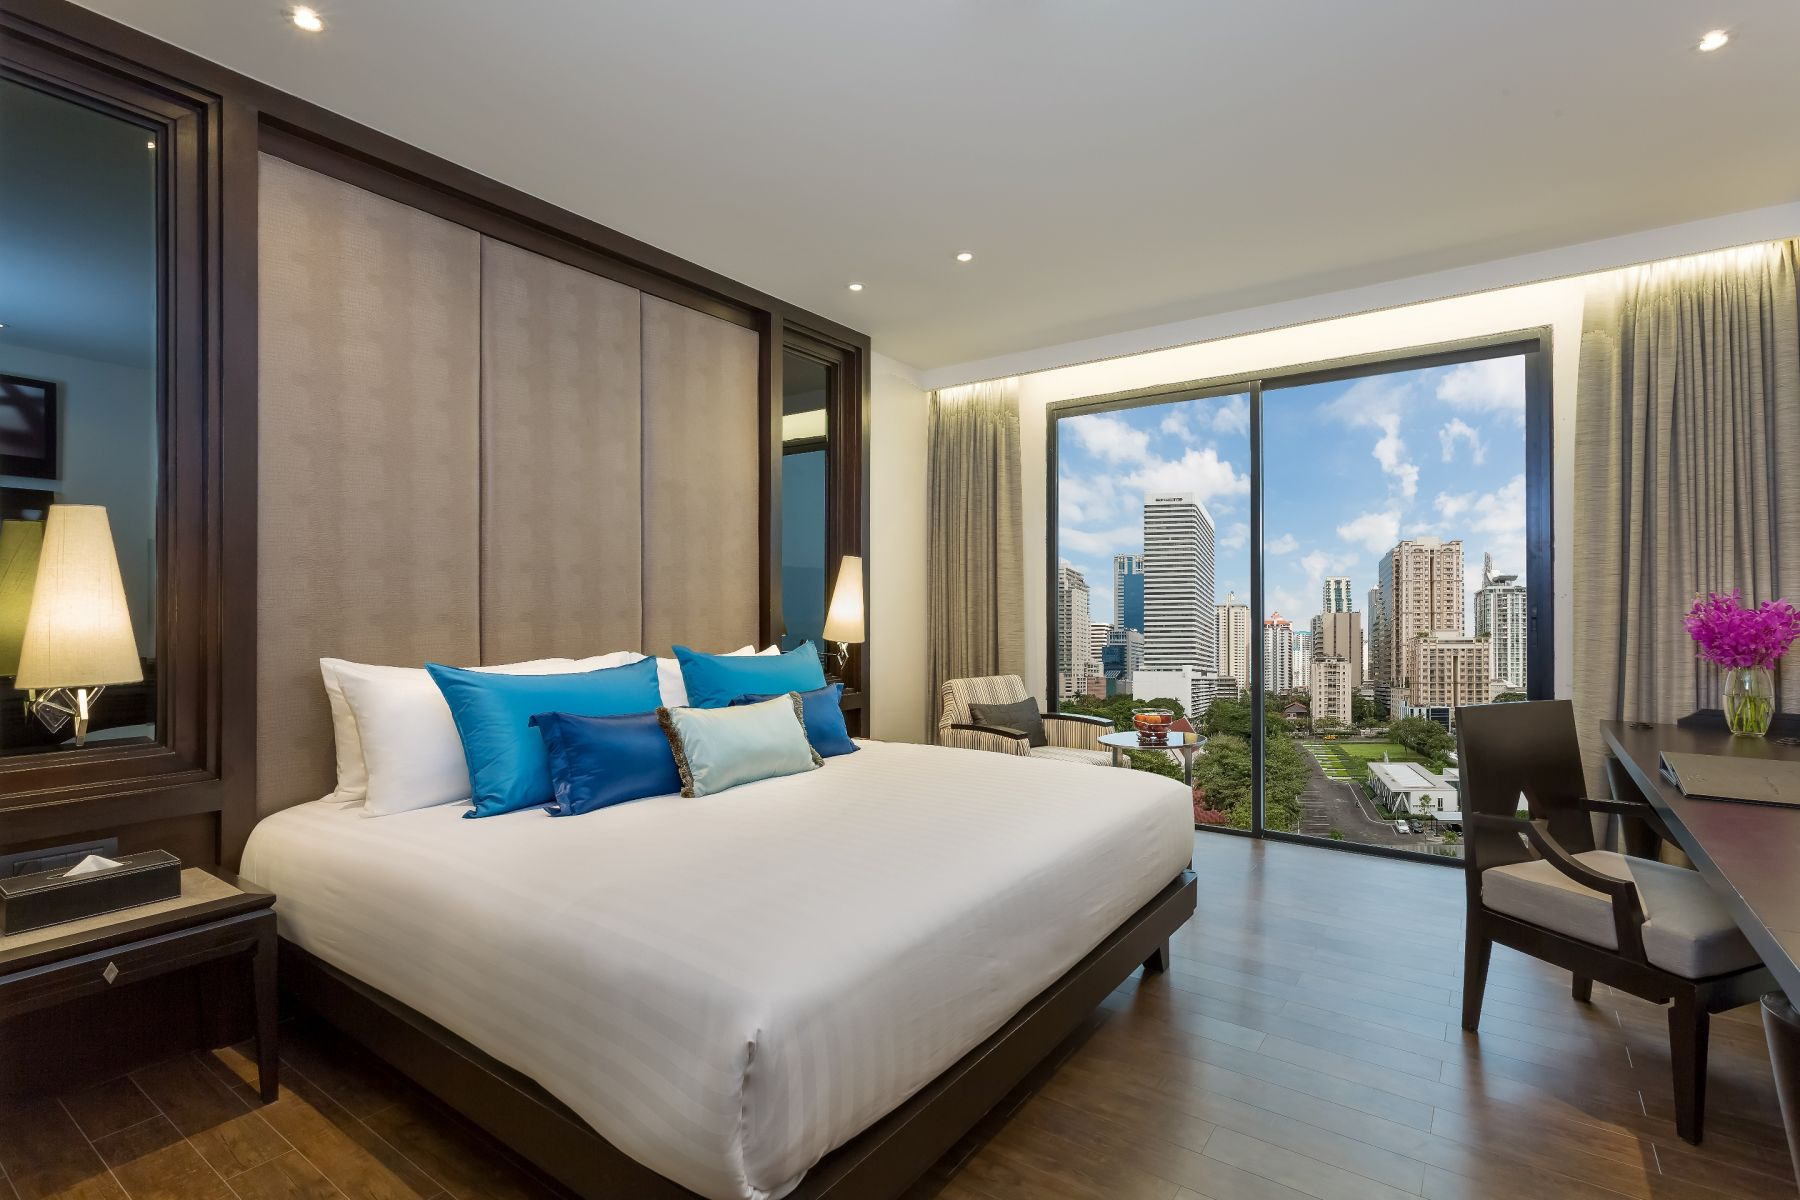 M 246 Venpick Hotels Amp Resorts Makes Bangkok Debut In Prime Location